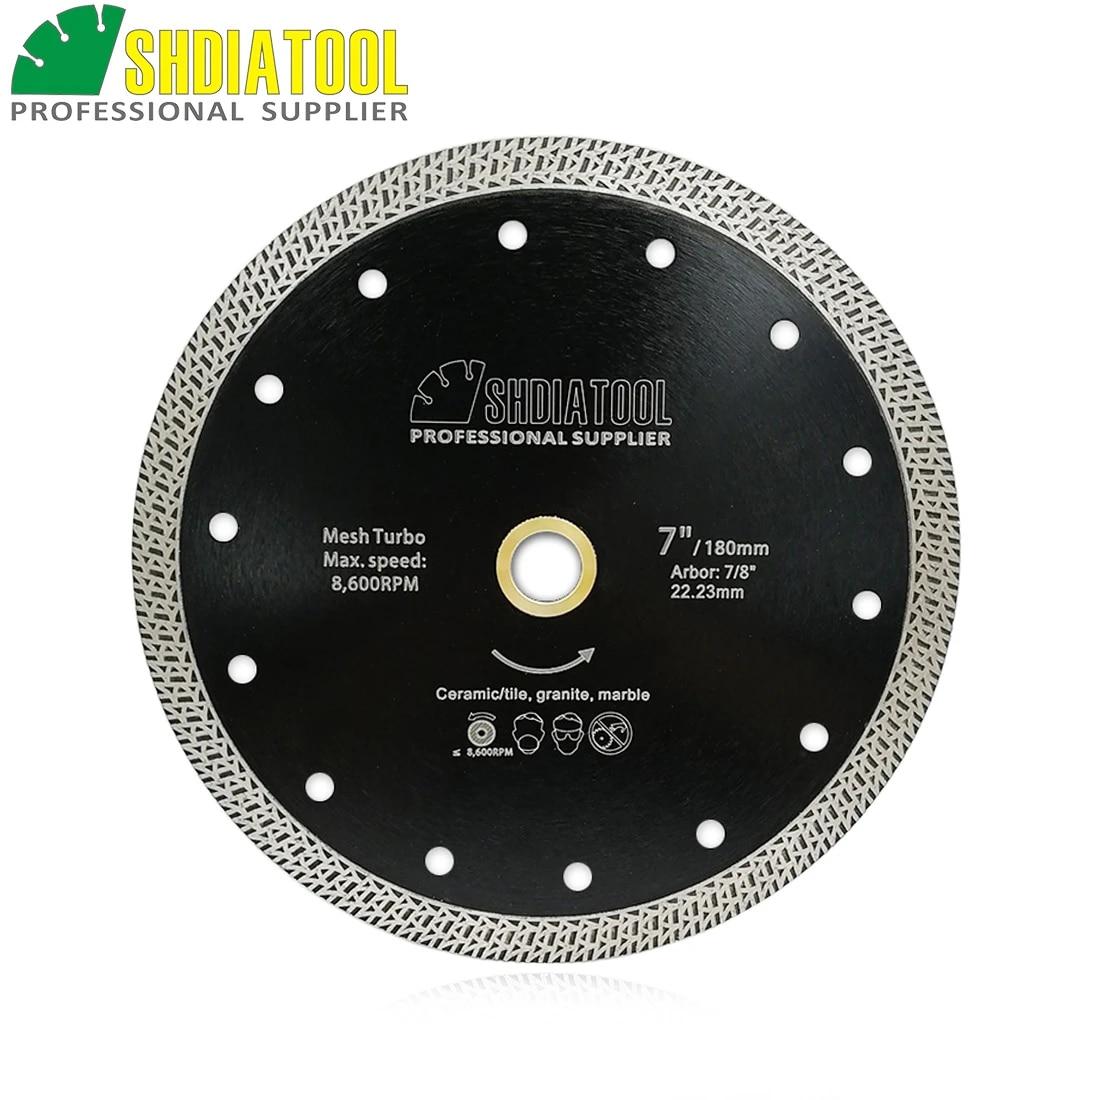 shdiatool 1pc dia 180mm 7 hot pressed sintered diamond cutting disc mesh turbo diamond saw blade granite marble tile ceramic